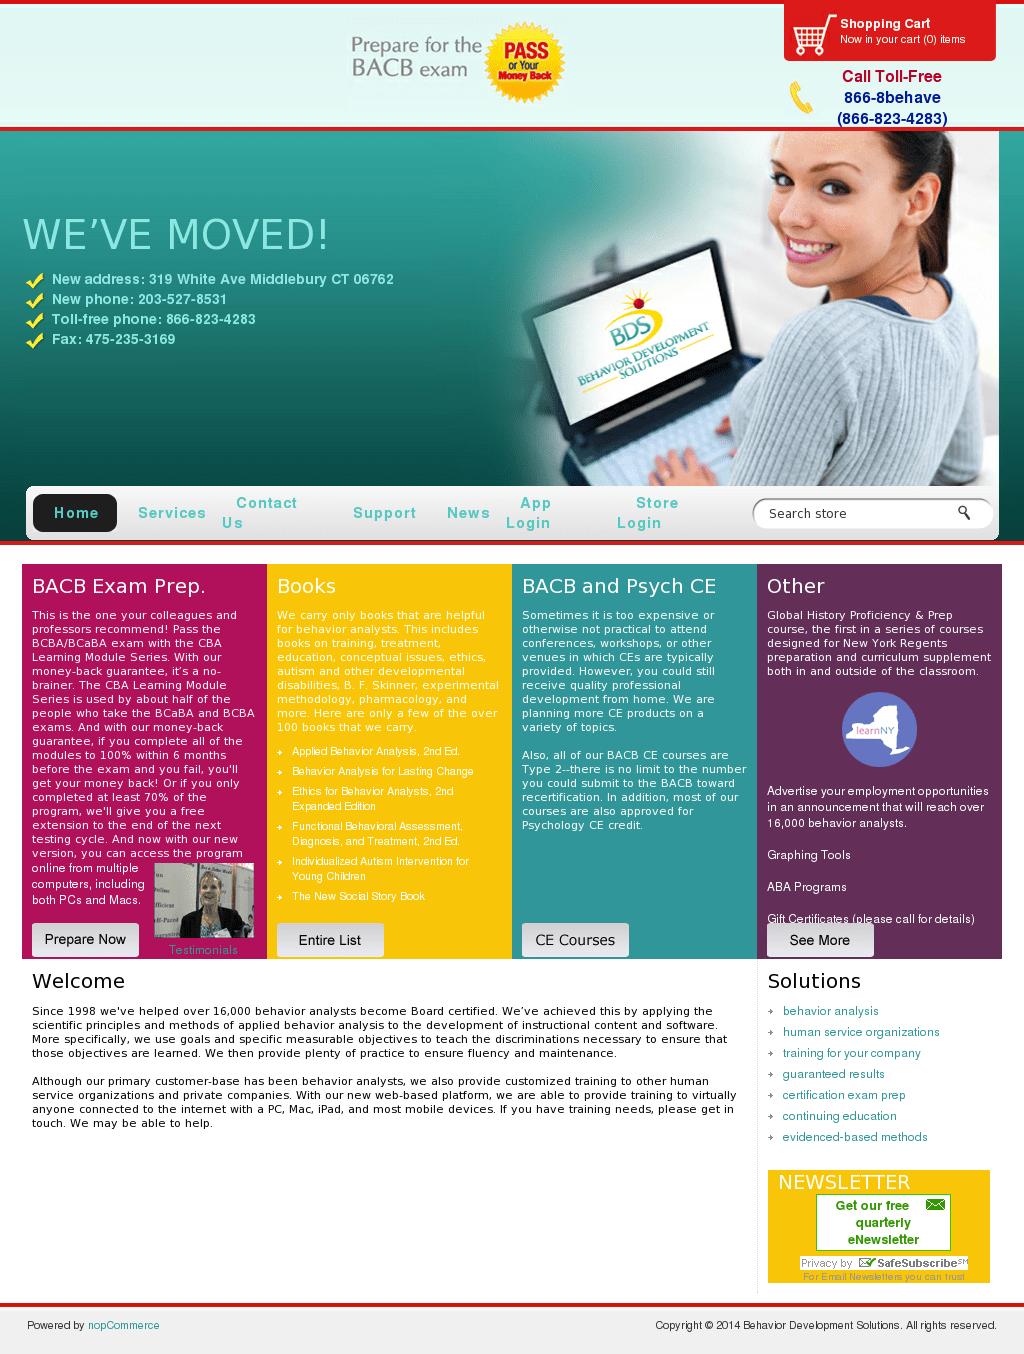 Behavior Development Solutions Competitors, Revenue And Employees - Owler  Company Profile